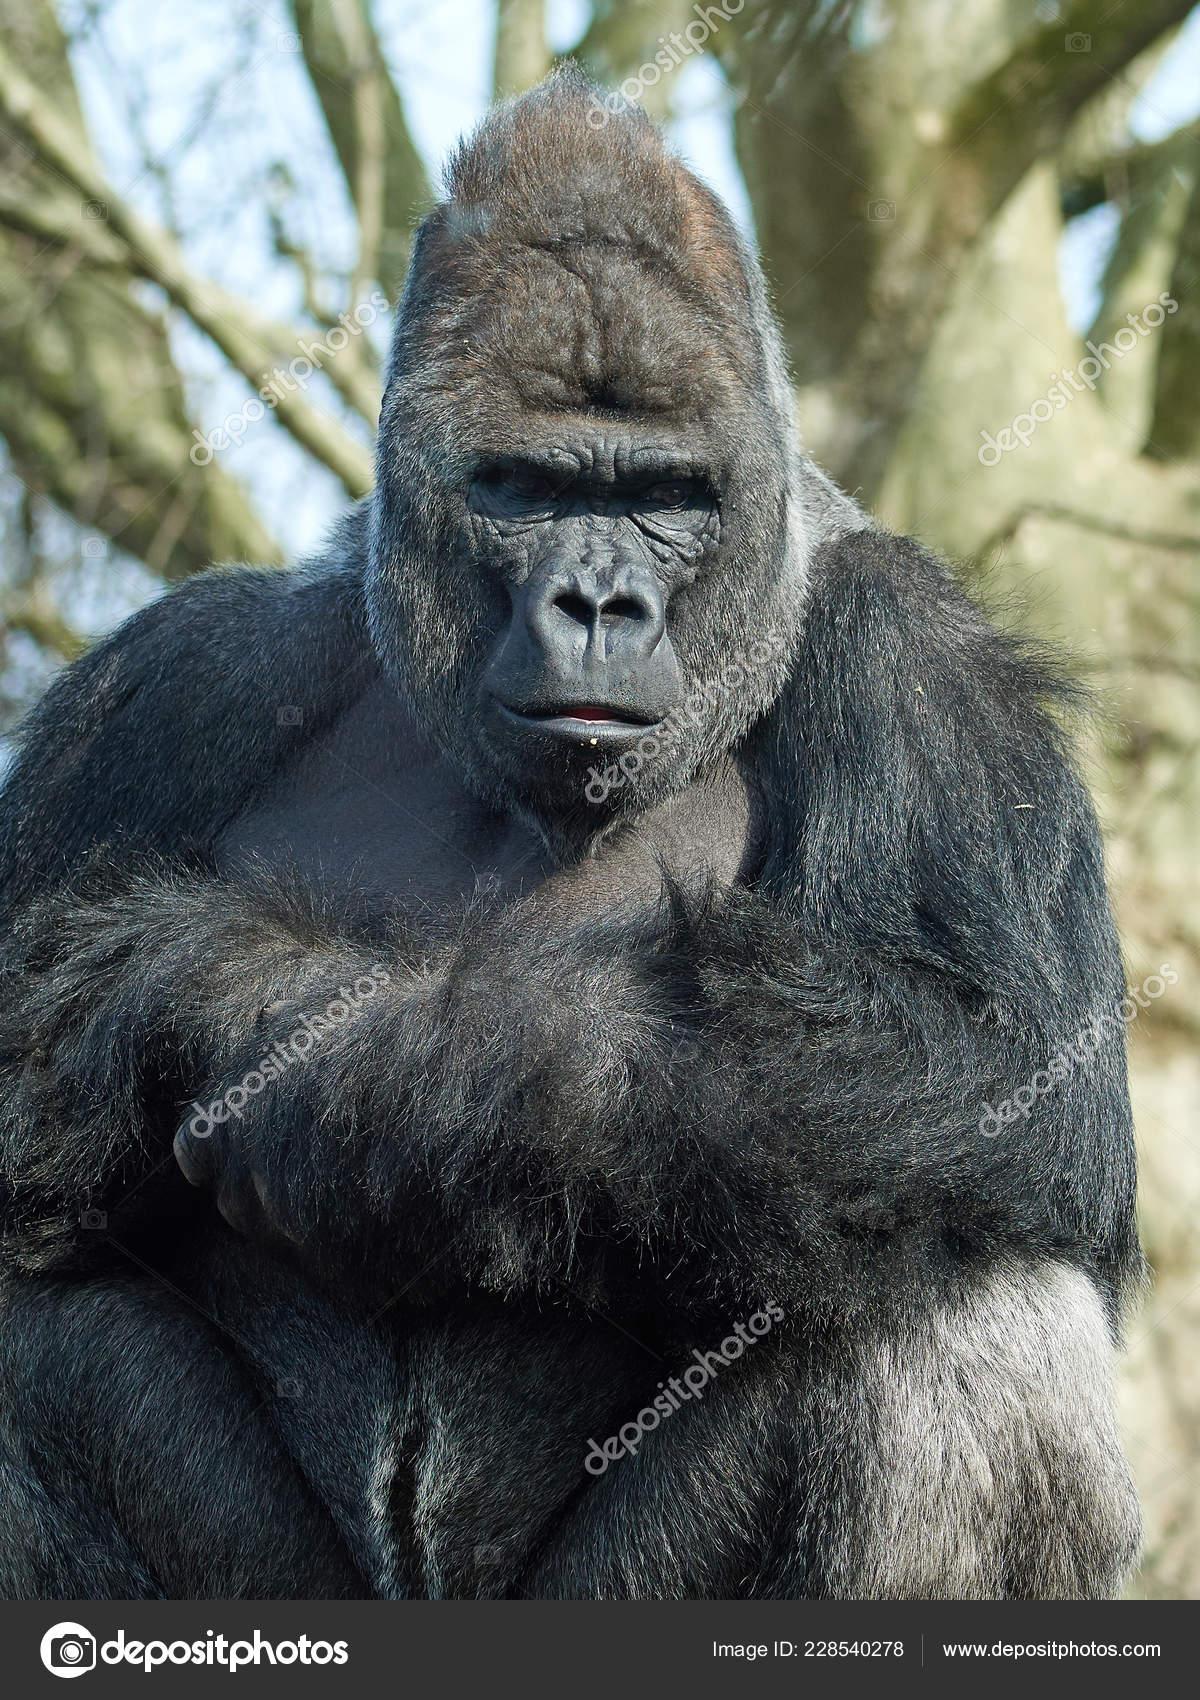 88f25866dd143 Portrait Western Gorilla Vegetation Background — Stock Photo ...